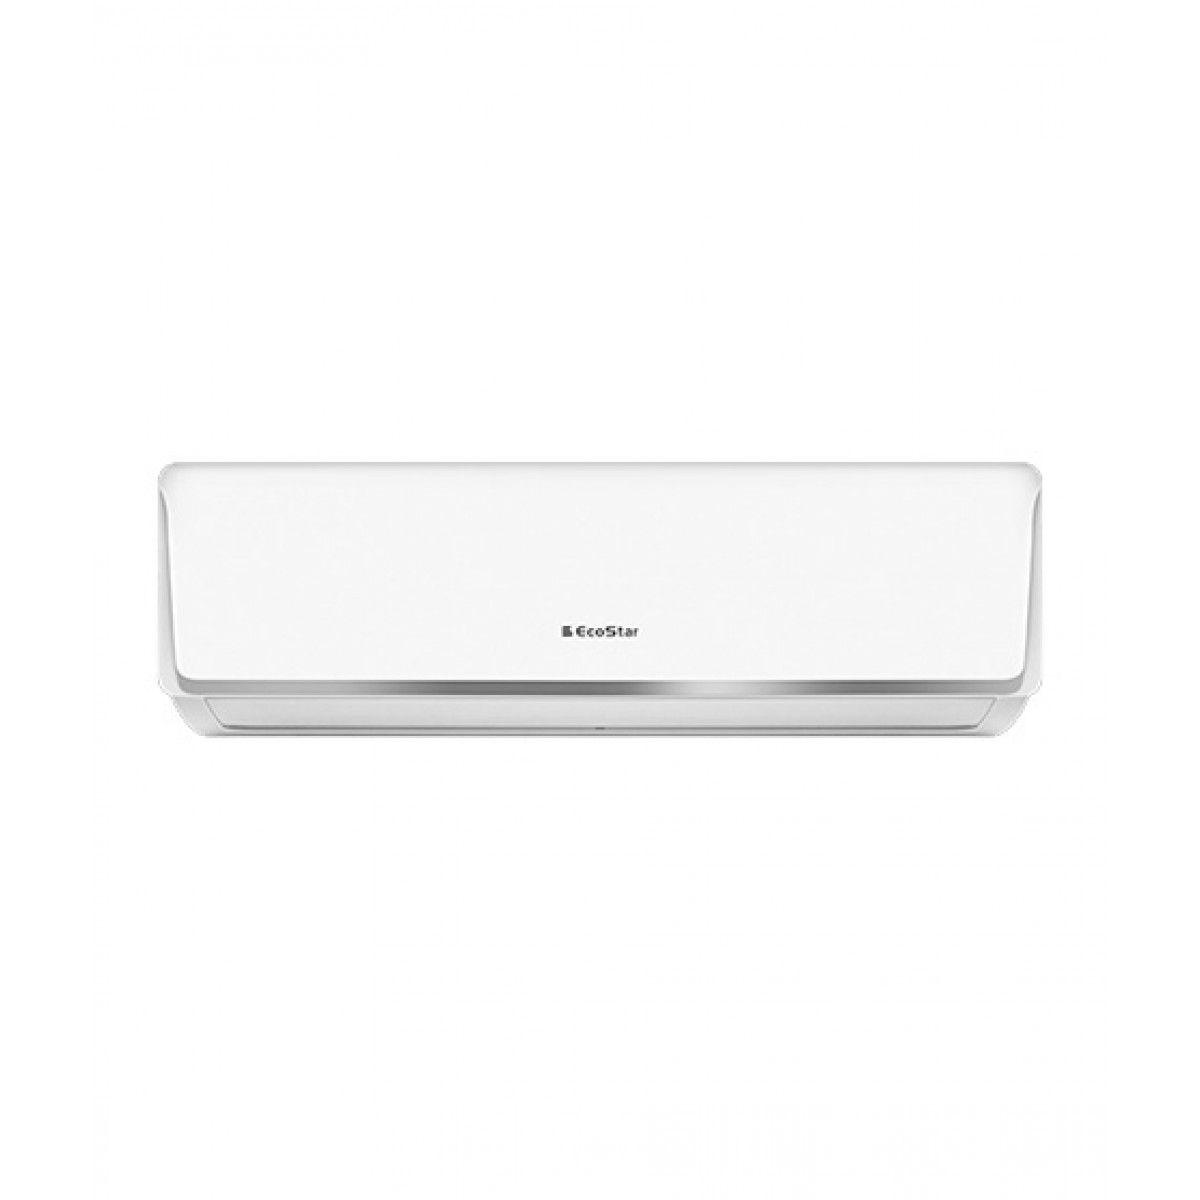 Ecostar Inverter AC 1.0 Ton (ES-12AR01WMEM)